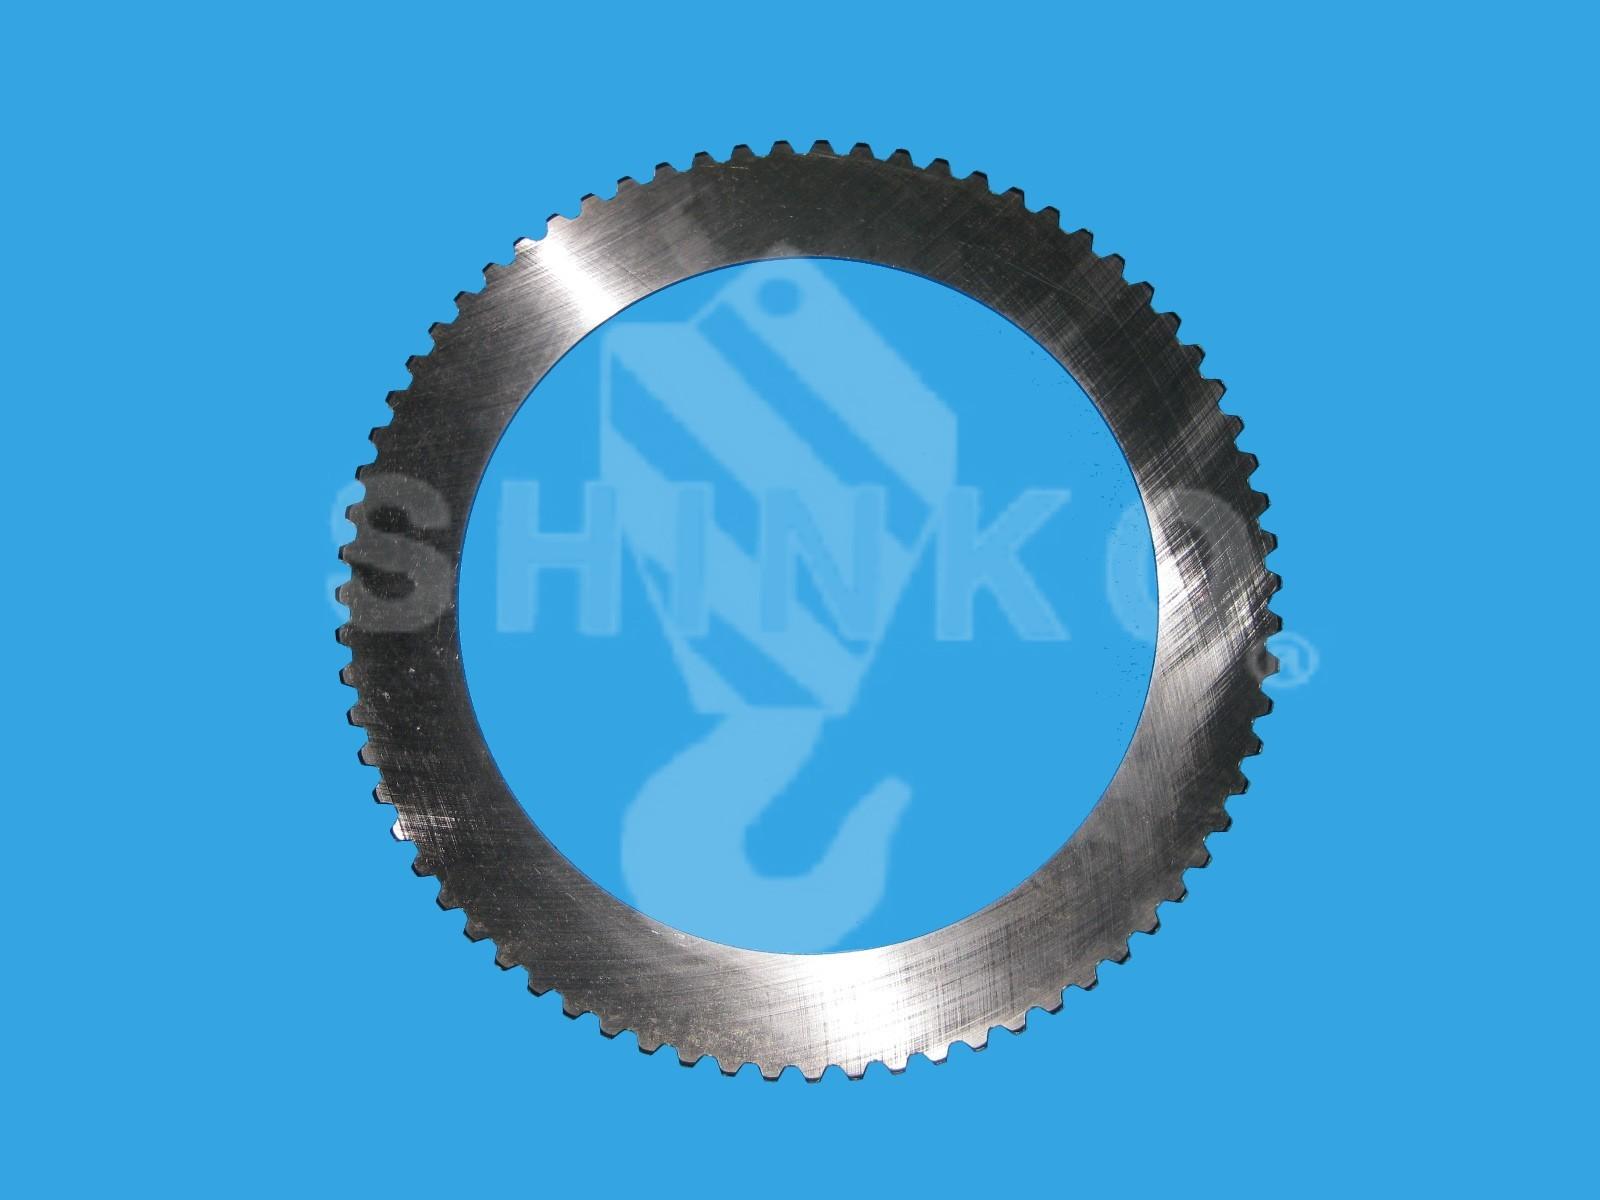 VB 0616 30012 0 RK250-2 Steel Converter Plate